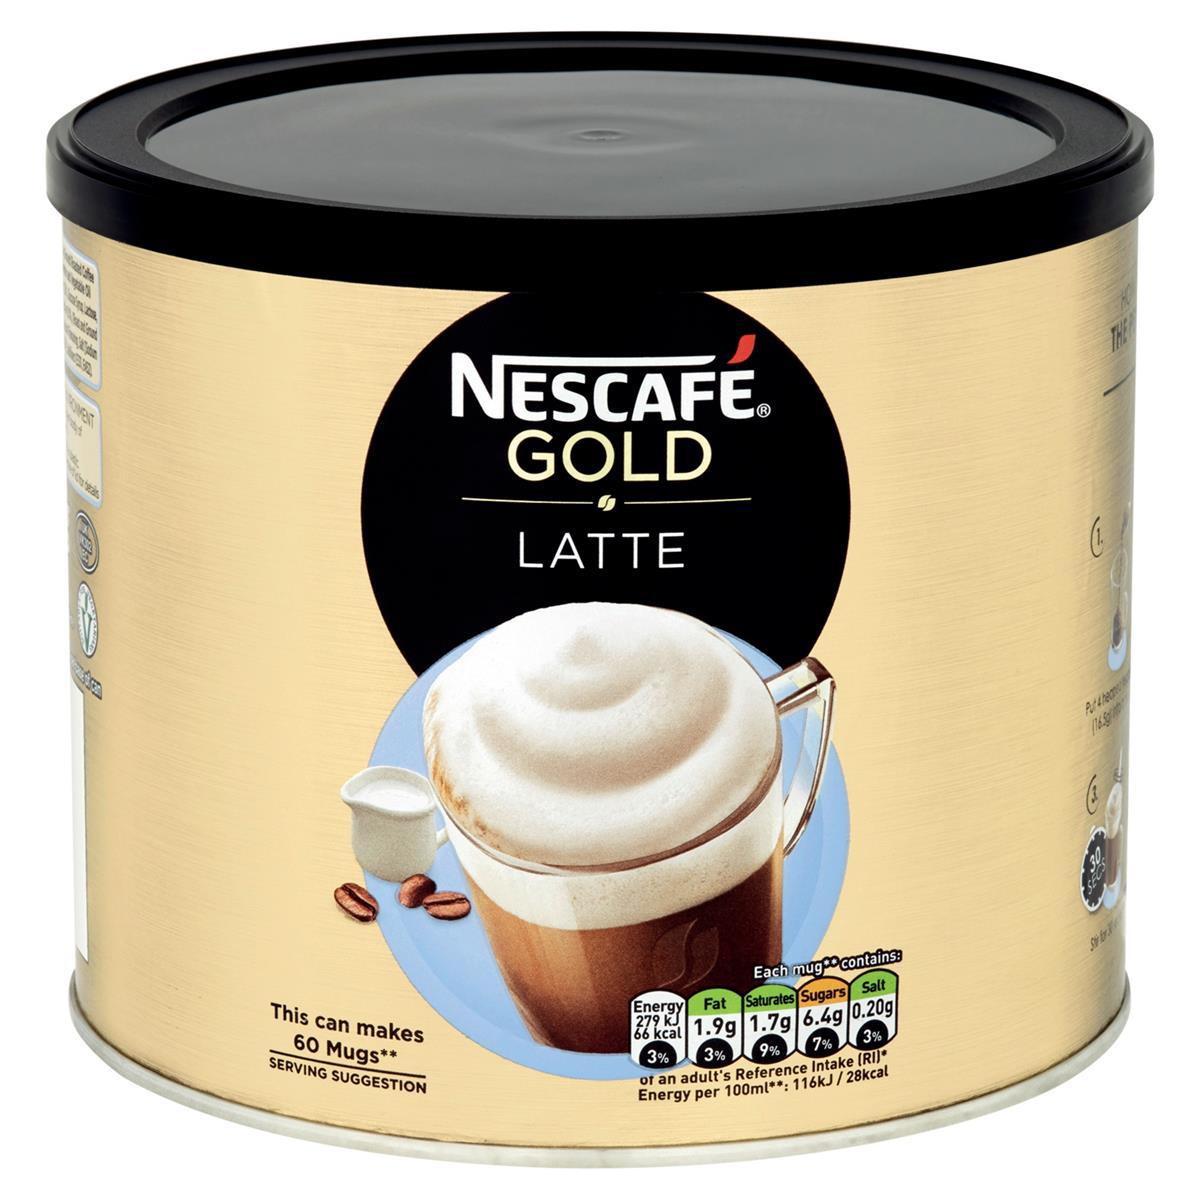 Demerara Brown Sugar Sachets Pack 600 Woods Business Services Ltd Sucralose Tate Lyle 100ml Nescafe Gold Latte Instant Coffee 1kg Ref 12314885